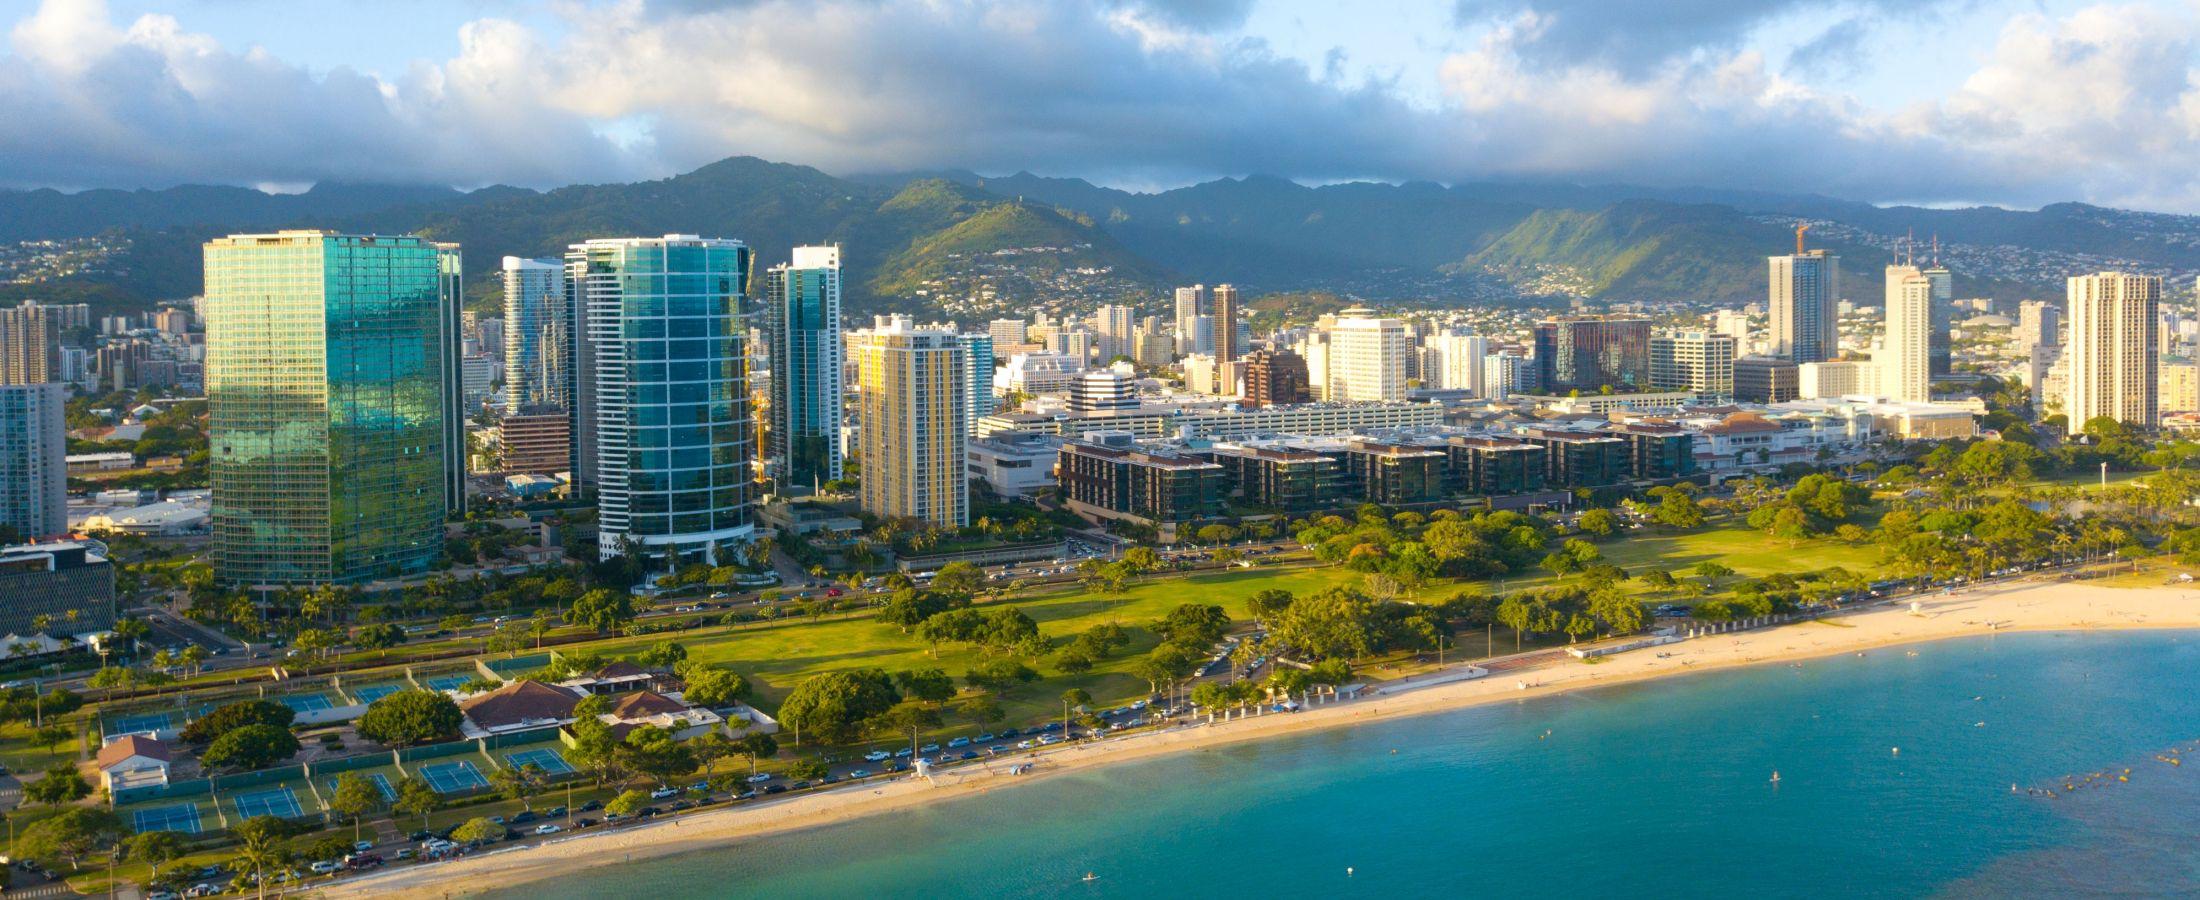 Hawaii U0026 Oahu Coastal U0026 Waterfront Real Estate, Homes For ...